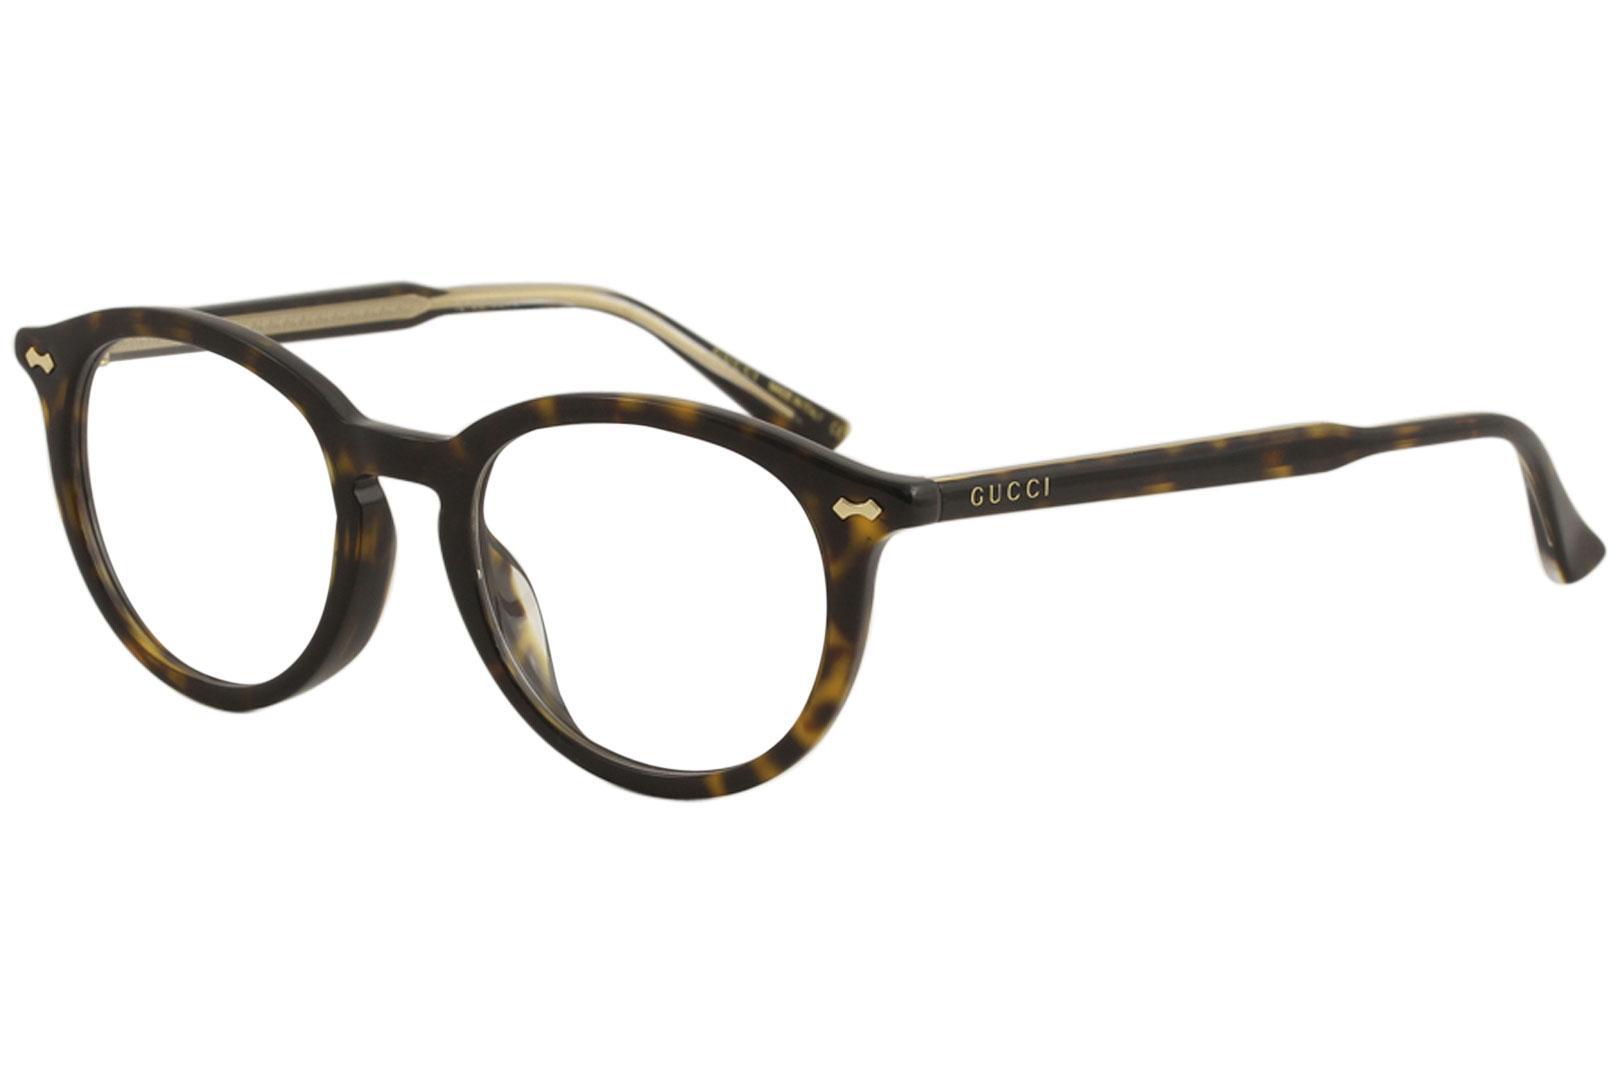 3066d94230ed Gucci Women's Eyeglasses GG0192OA GG/0192/OA Full Rim Optical Frame by Gucci.  1234